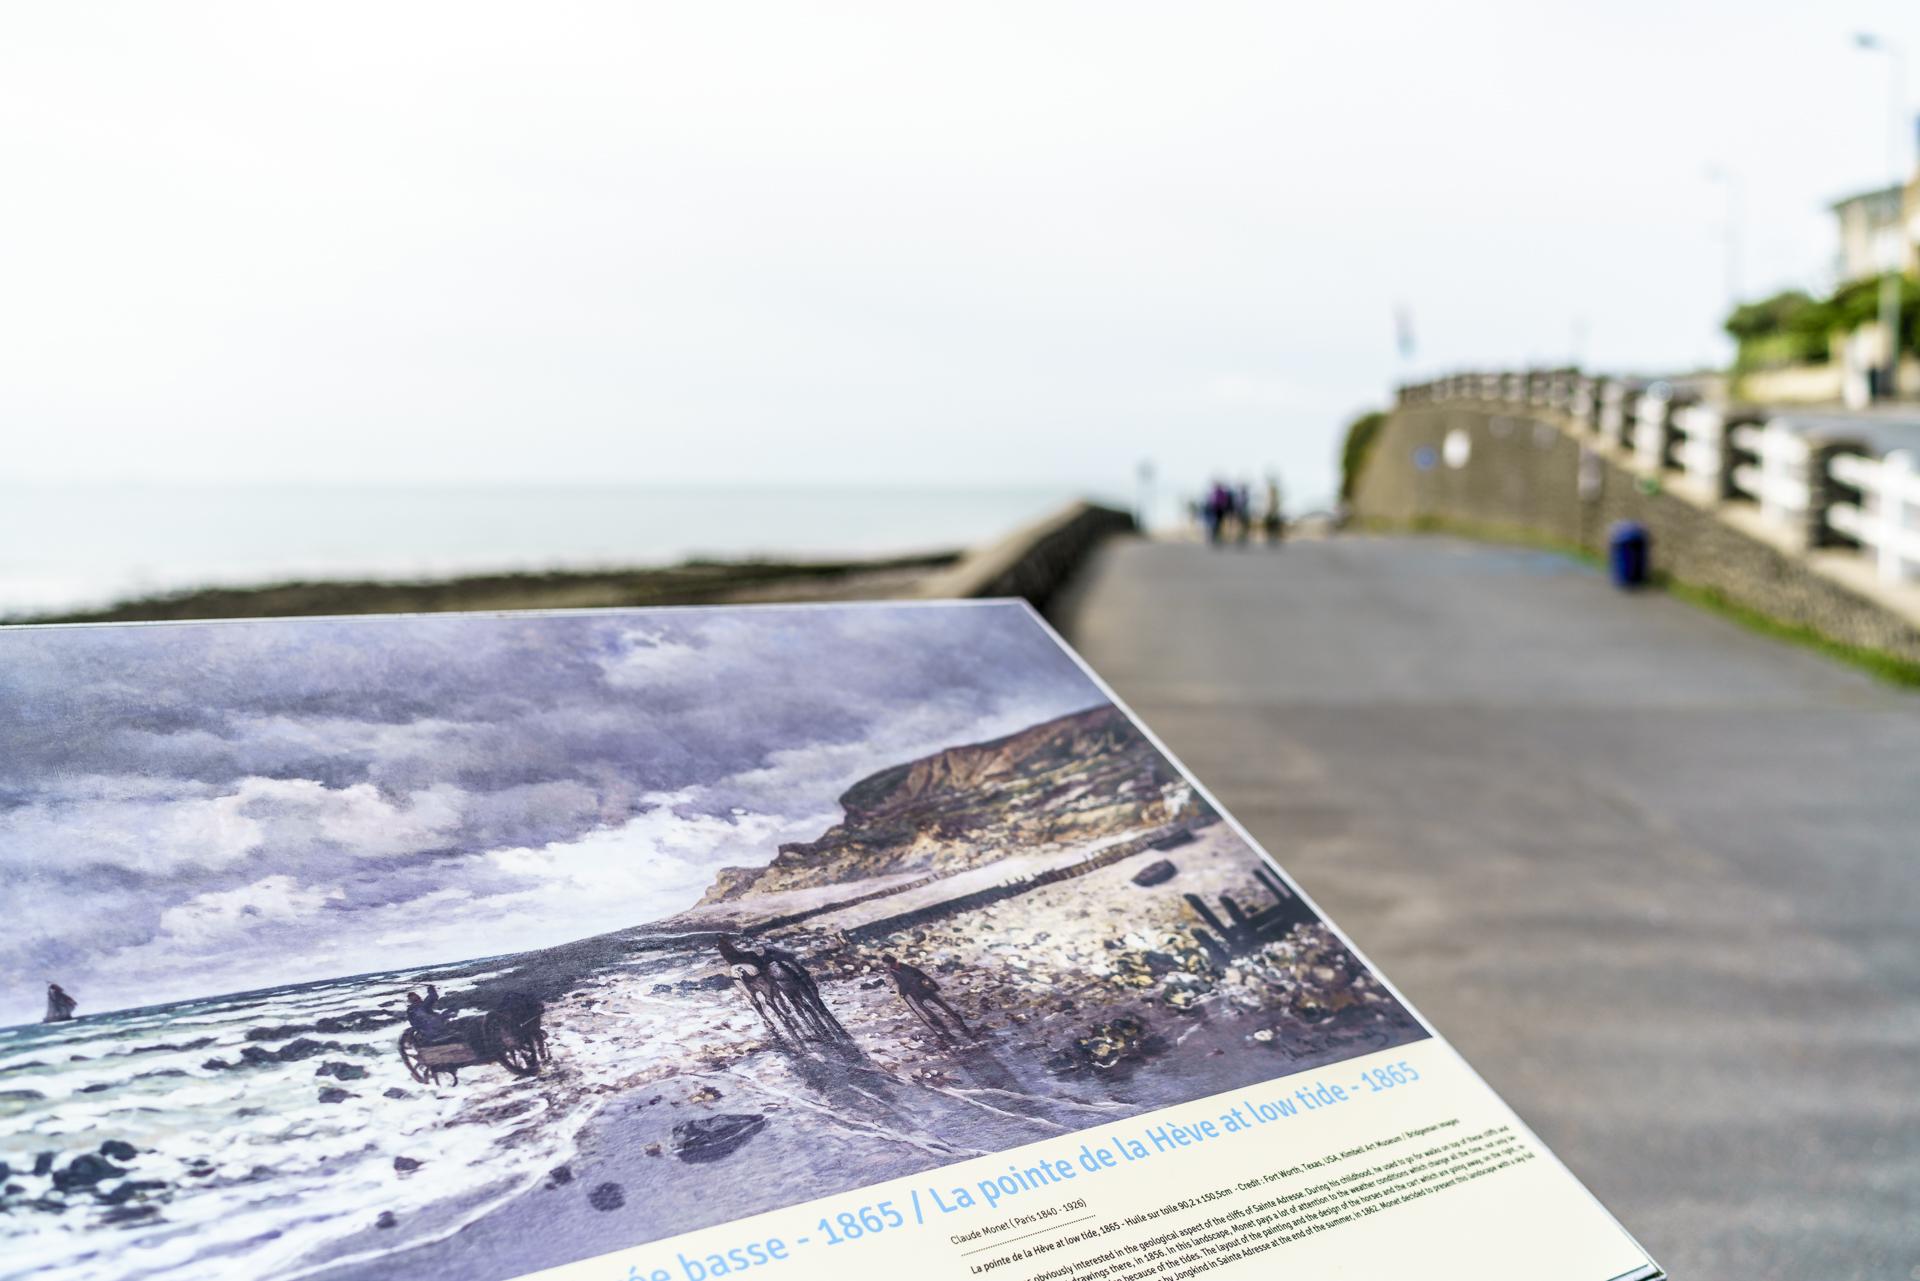 Saint-Adresse nach Le-Havre impressionisten Spaziergang